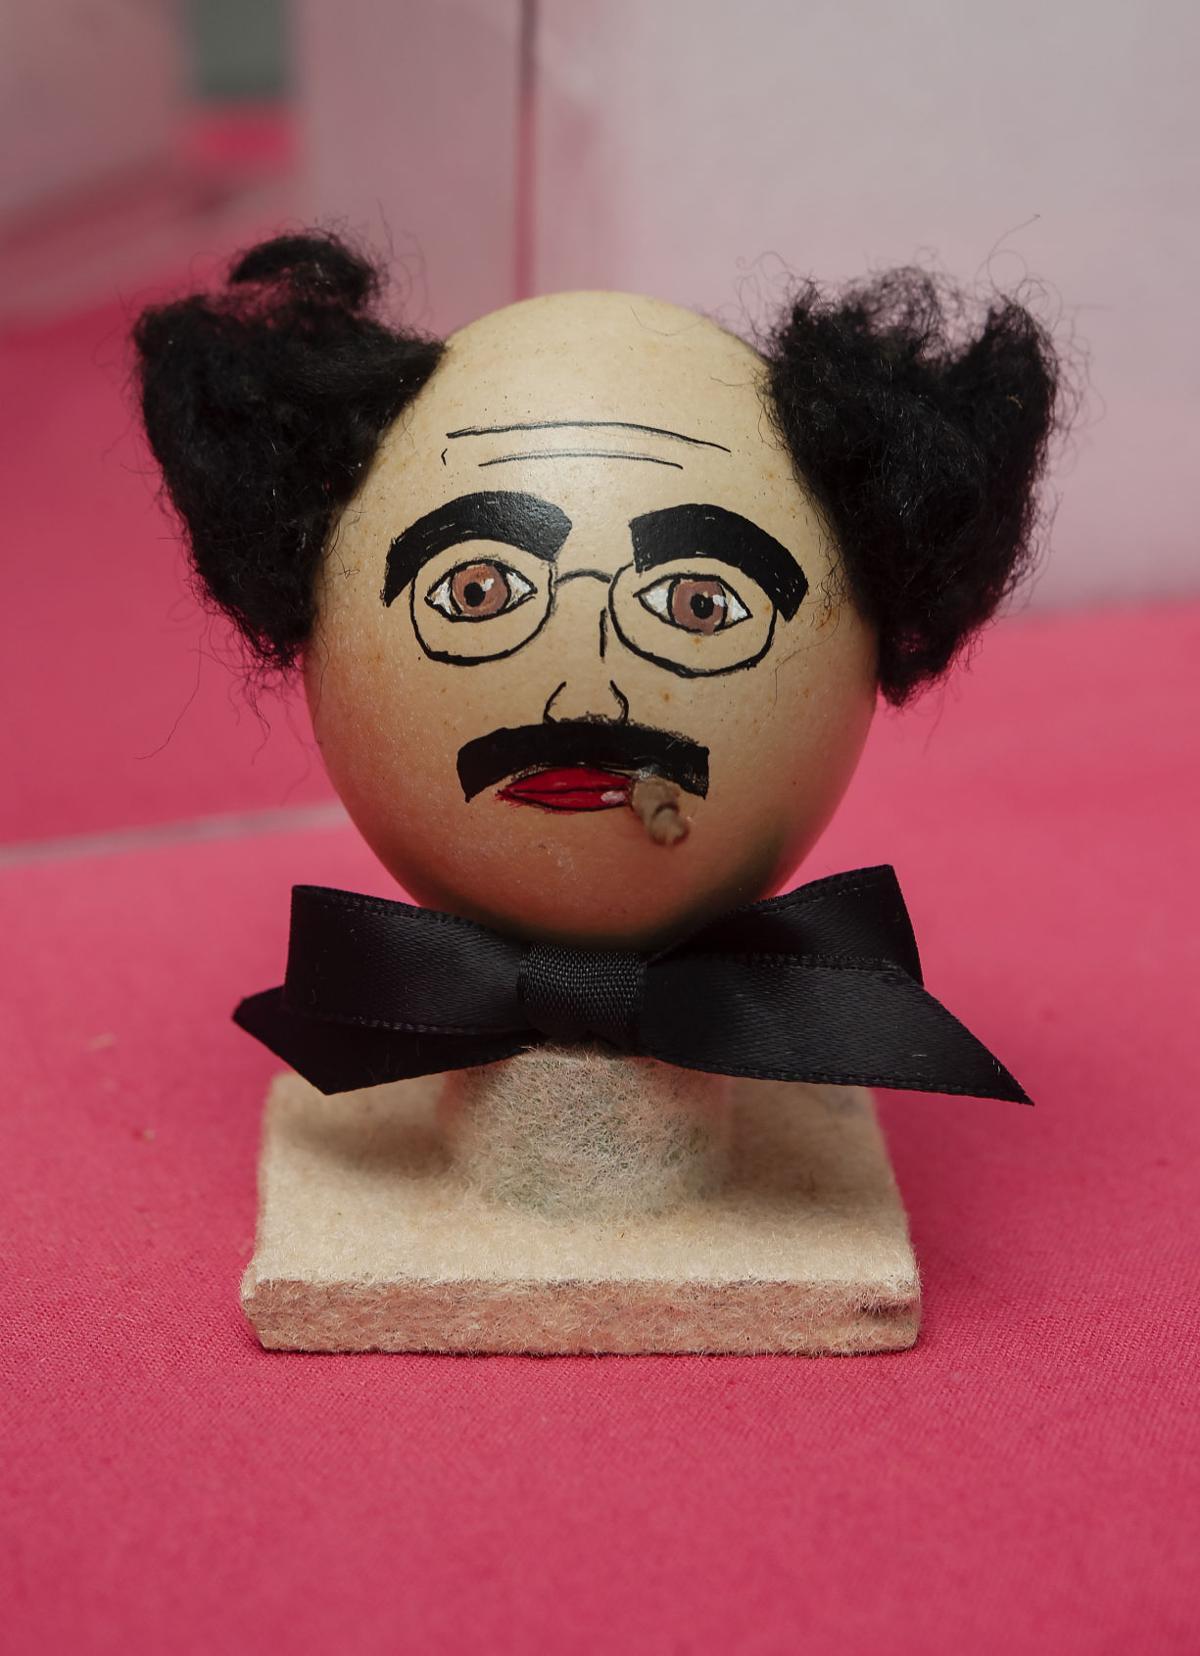 20190111_Dr_Kerfoot_Walker_collection_of_whimsical_blown_egg_art_17.jpg